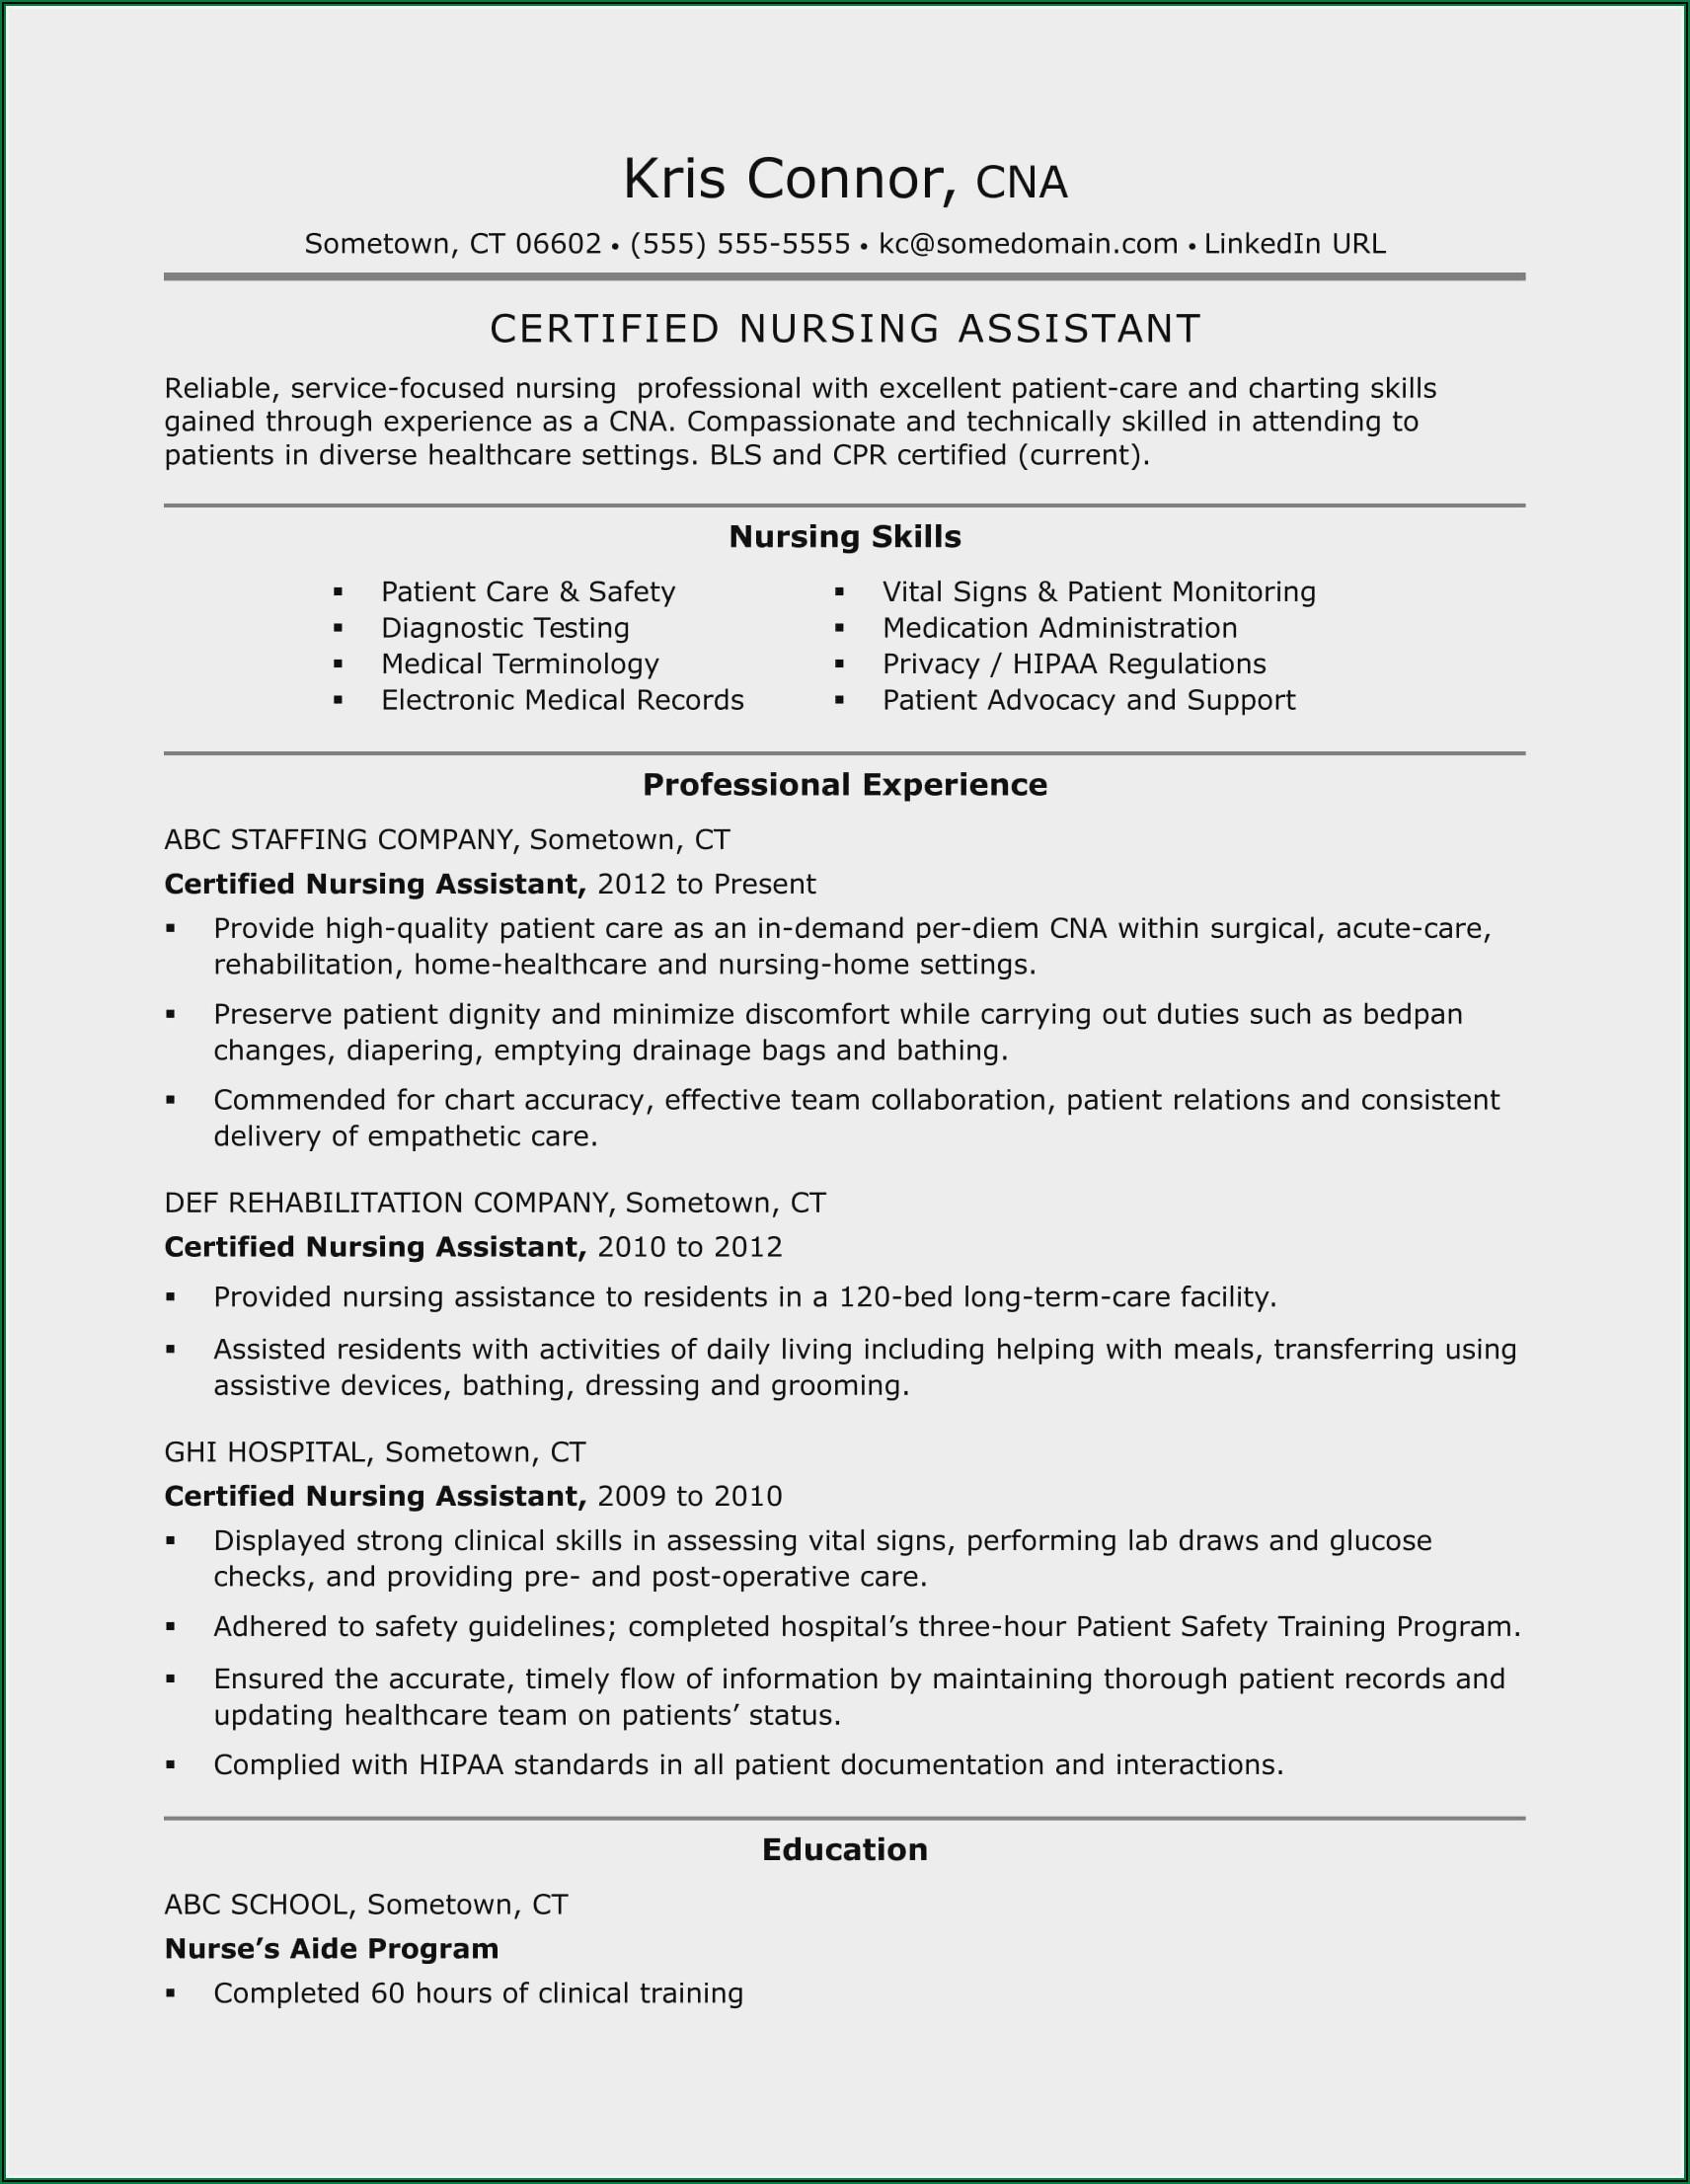 Resume Templates For Nursing Assistant